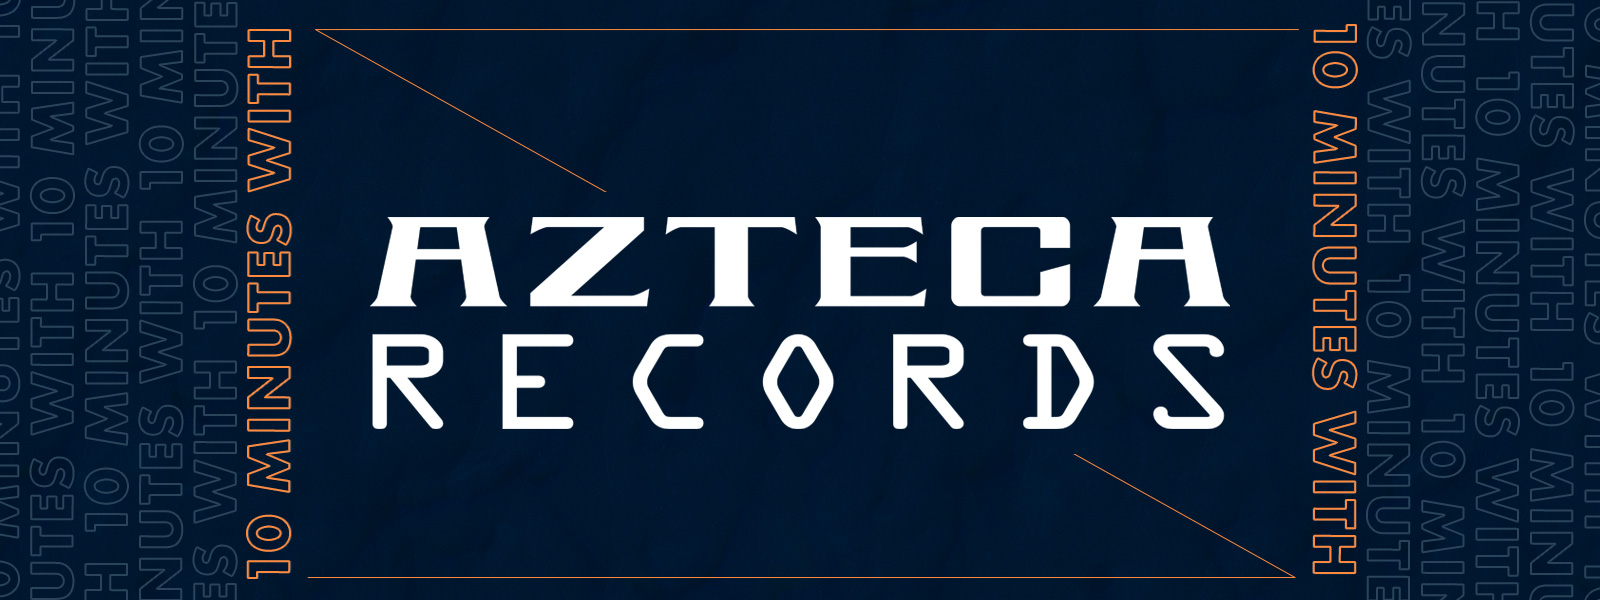 Ten Minutes With Azteca Records